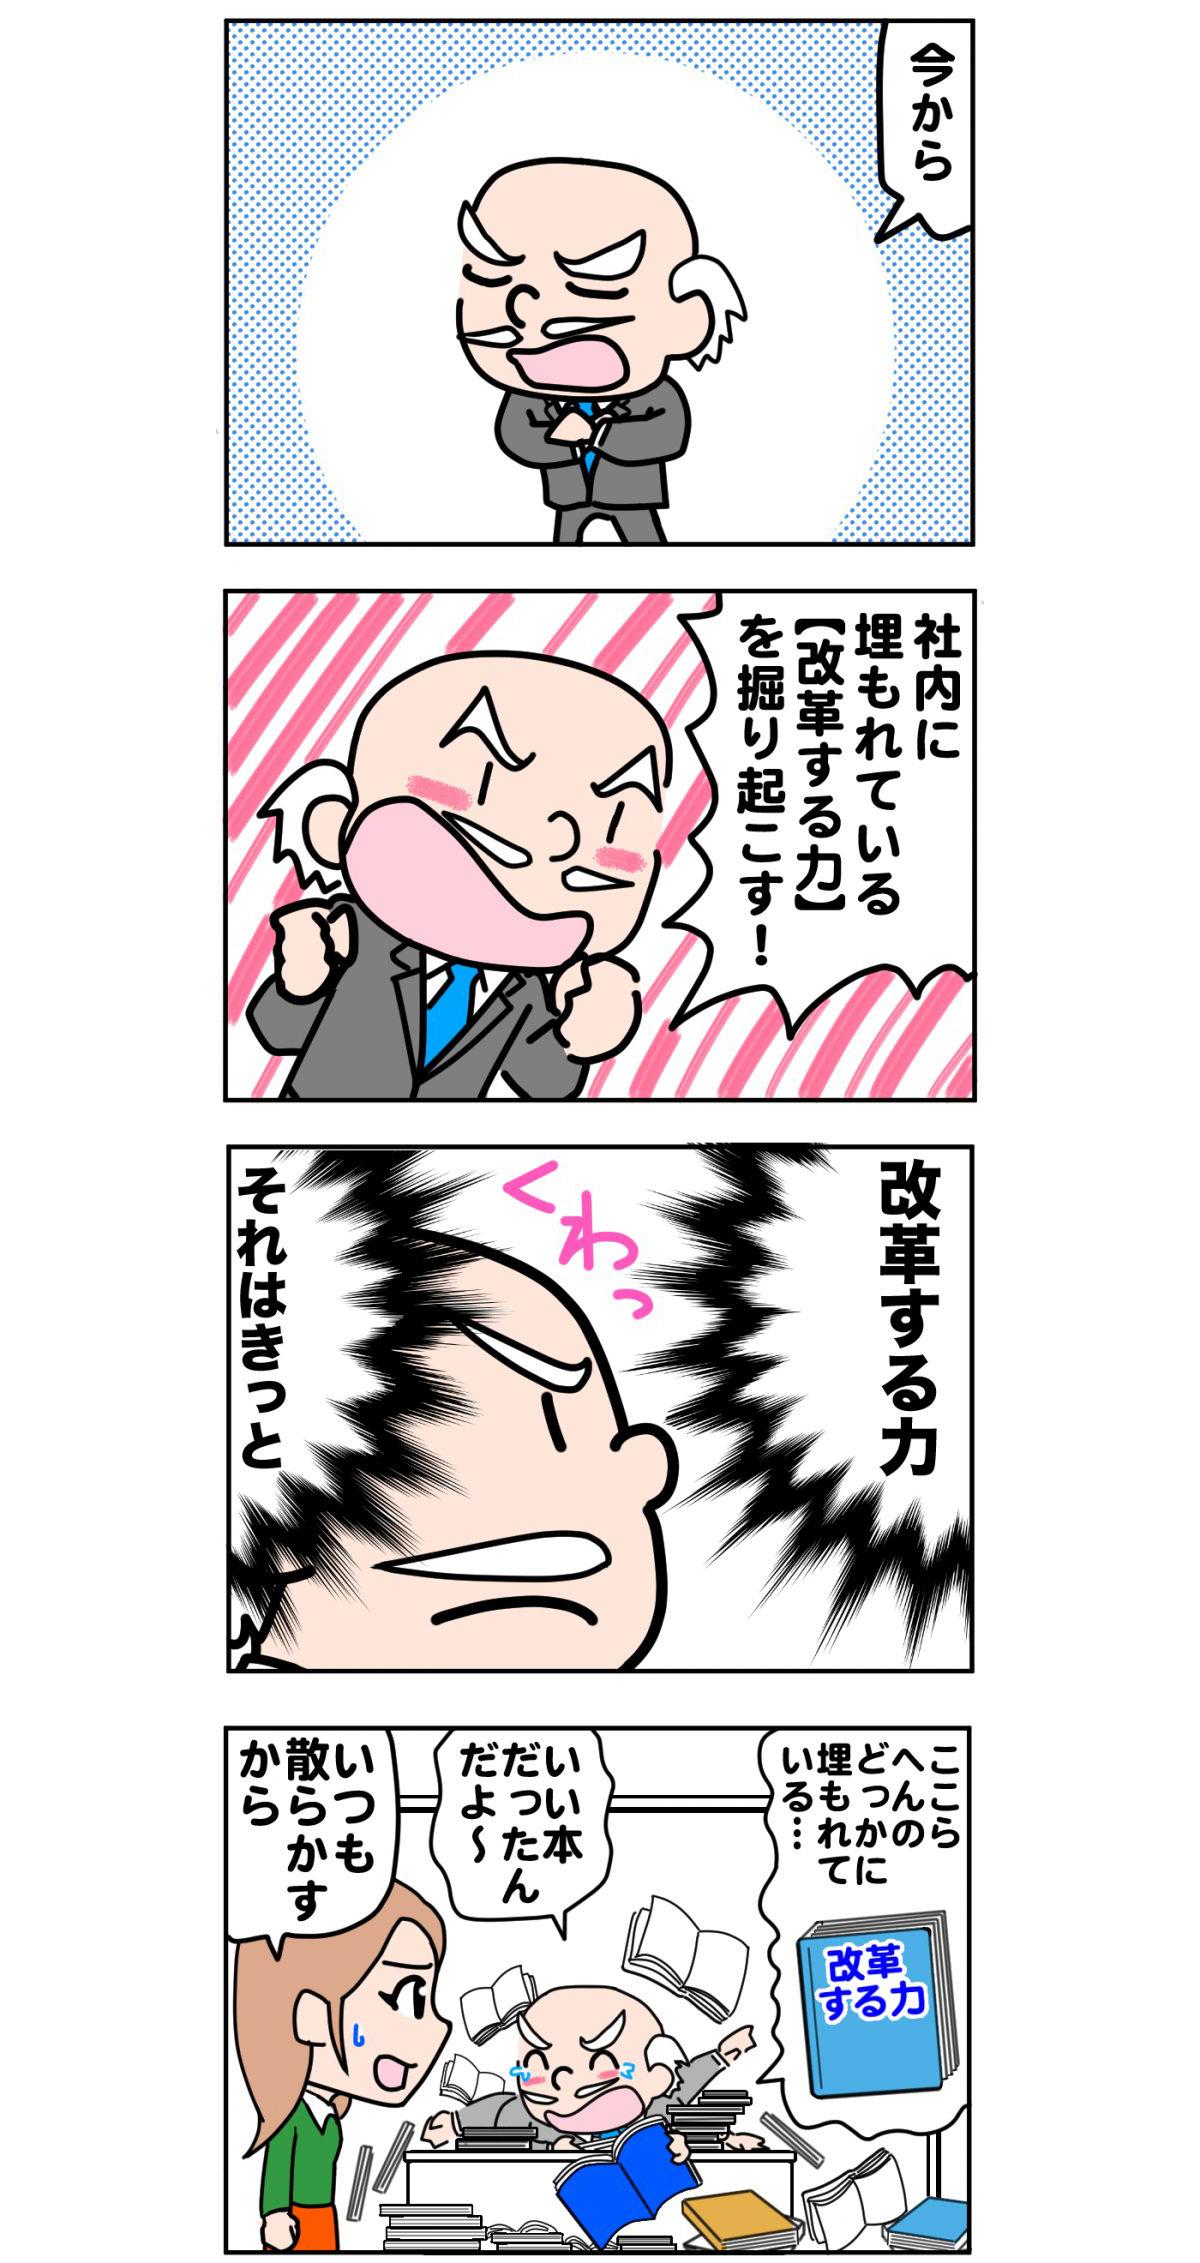 kaizen15-768x2263